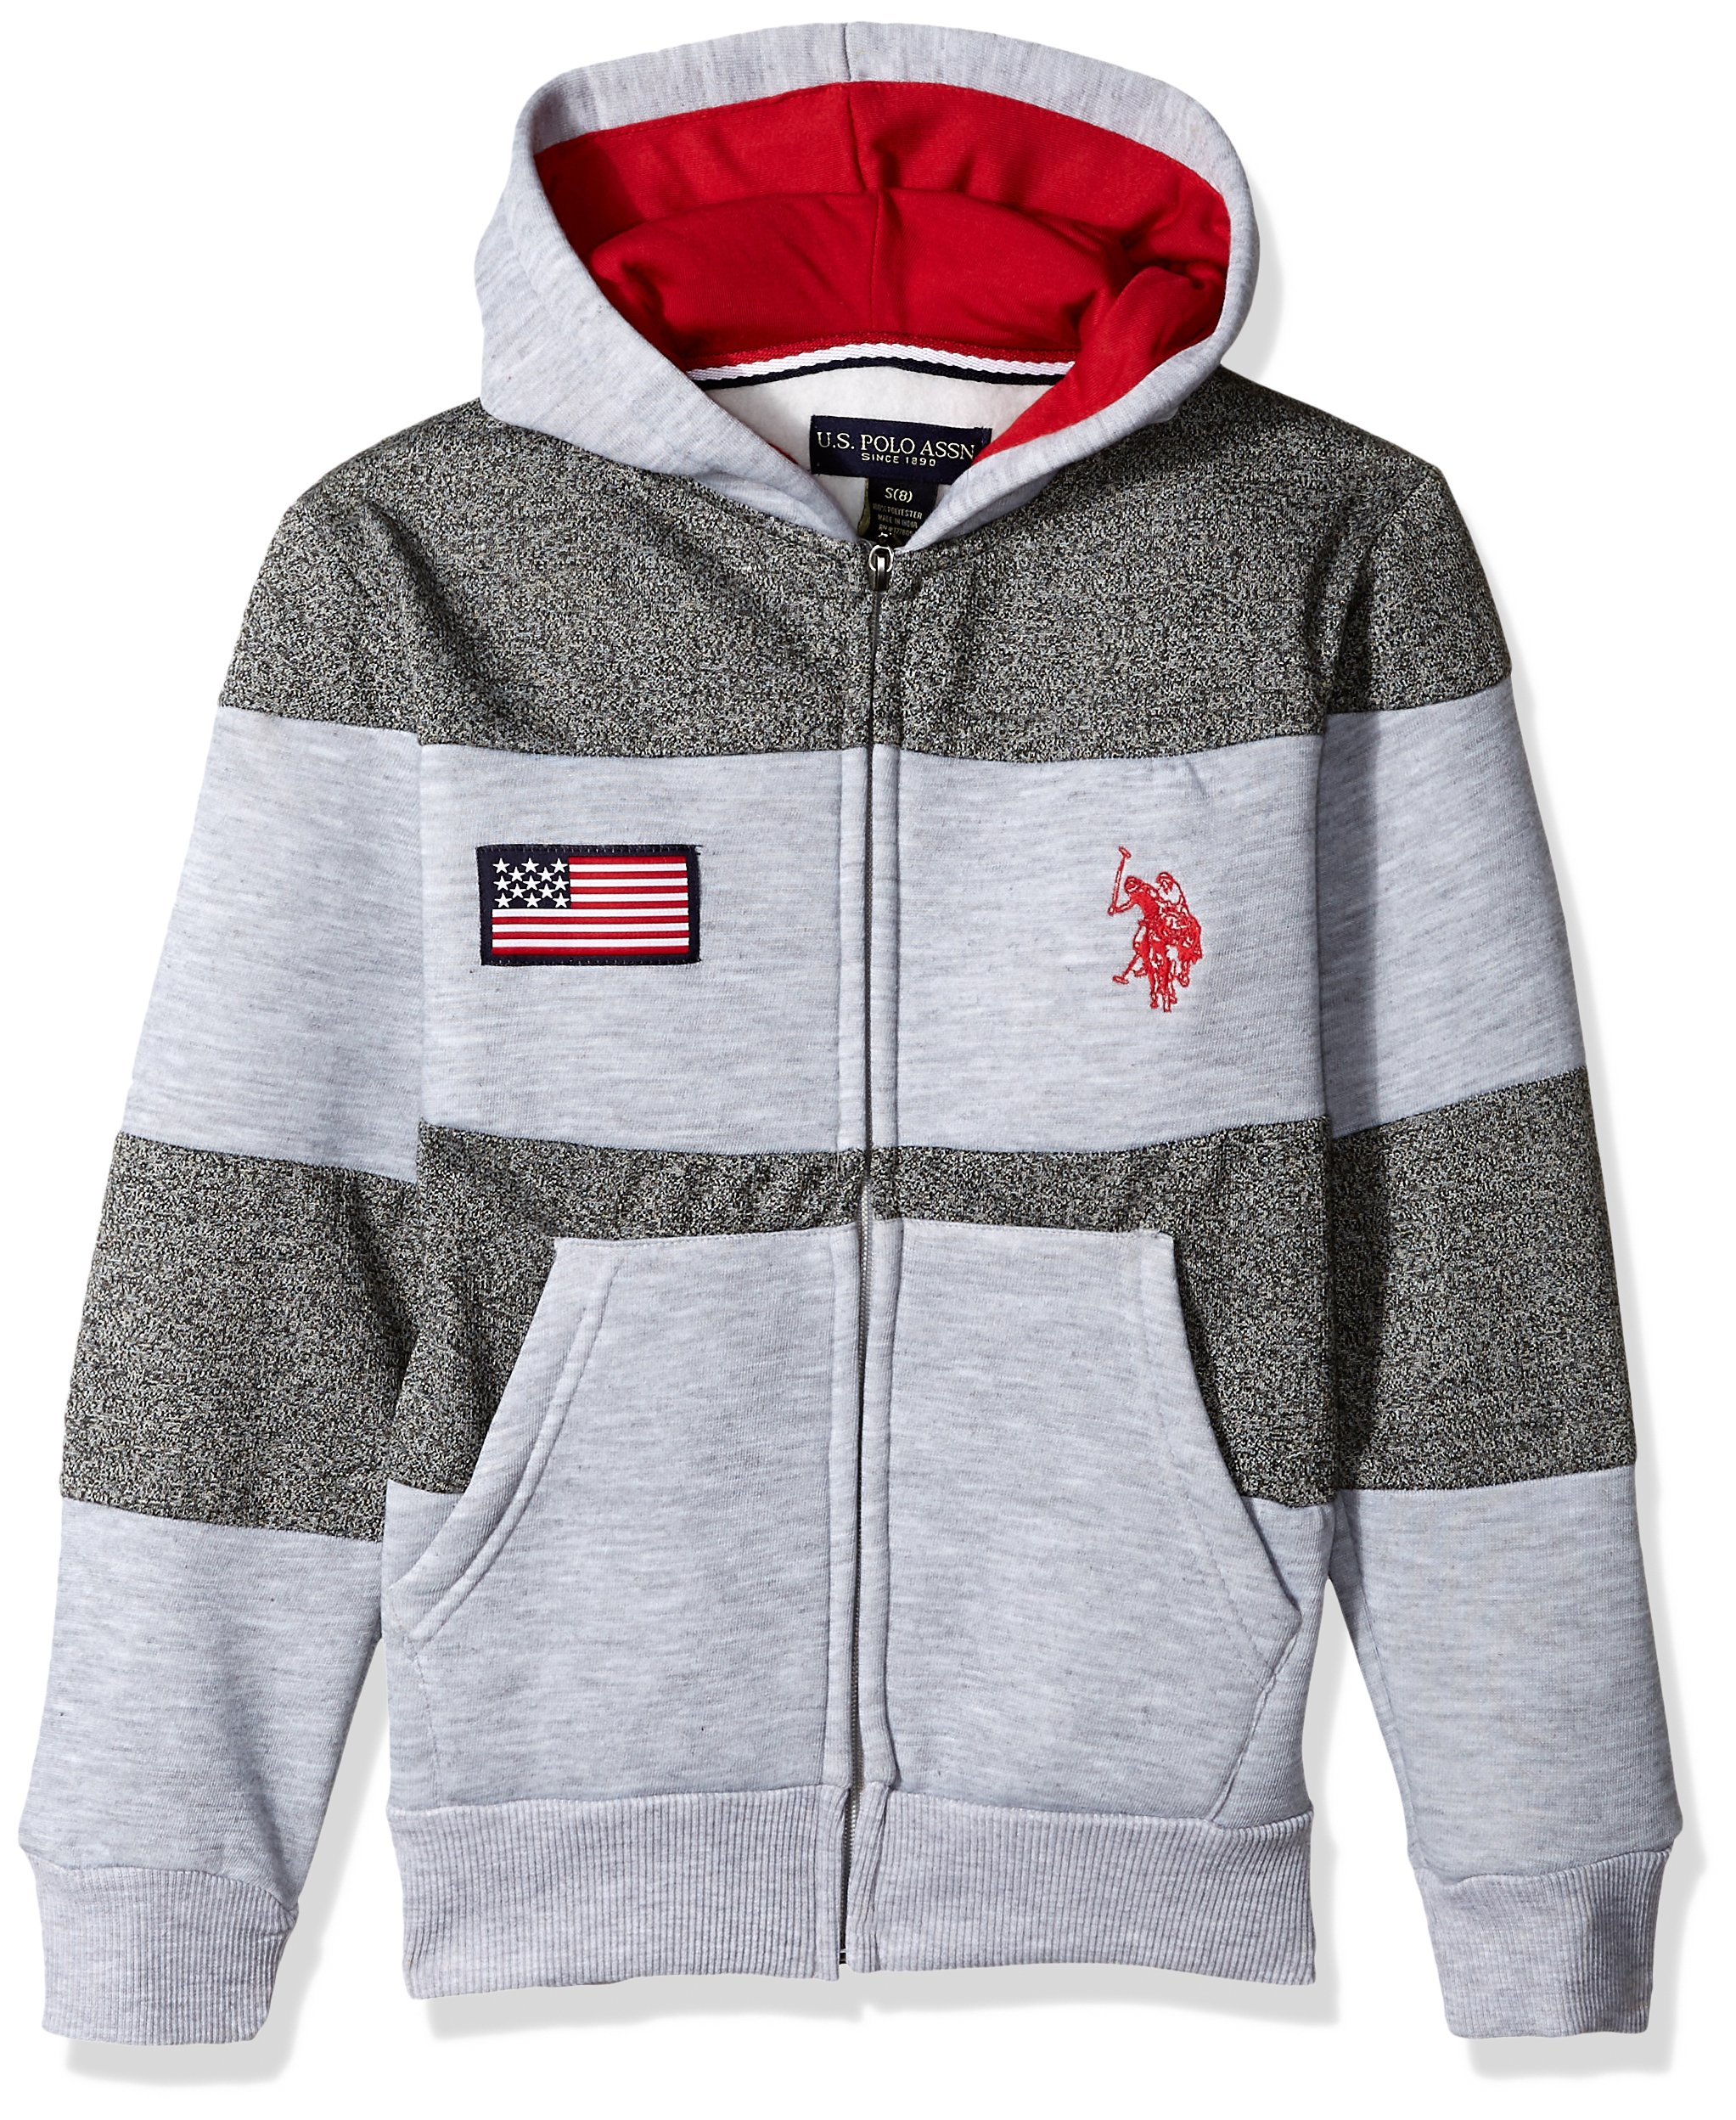 U.S. Polo Assn. Little Boys' Hooded Zip or Snap Fleece Jacket, American Flag Chest Light Heather Gray, 4